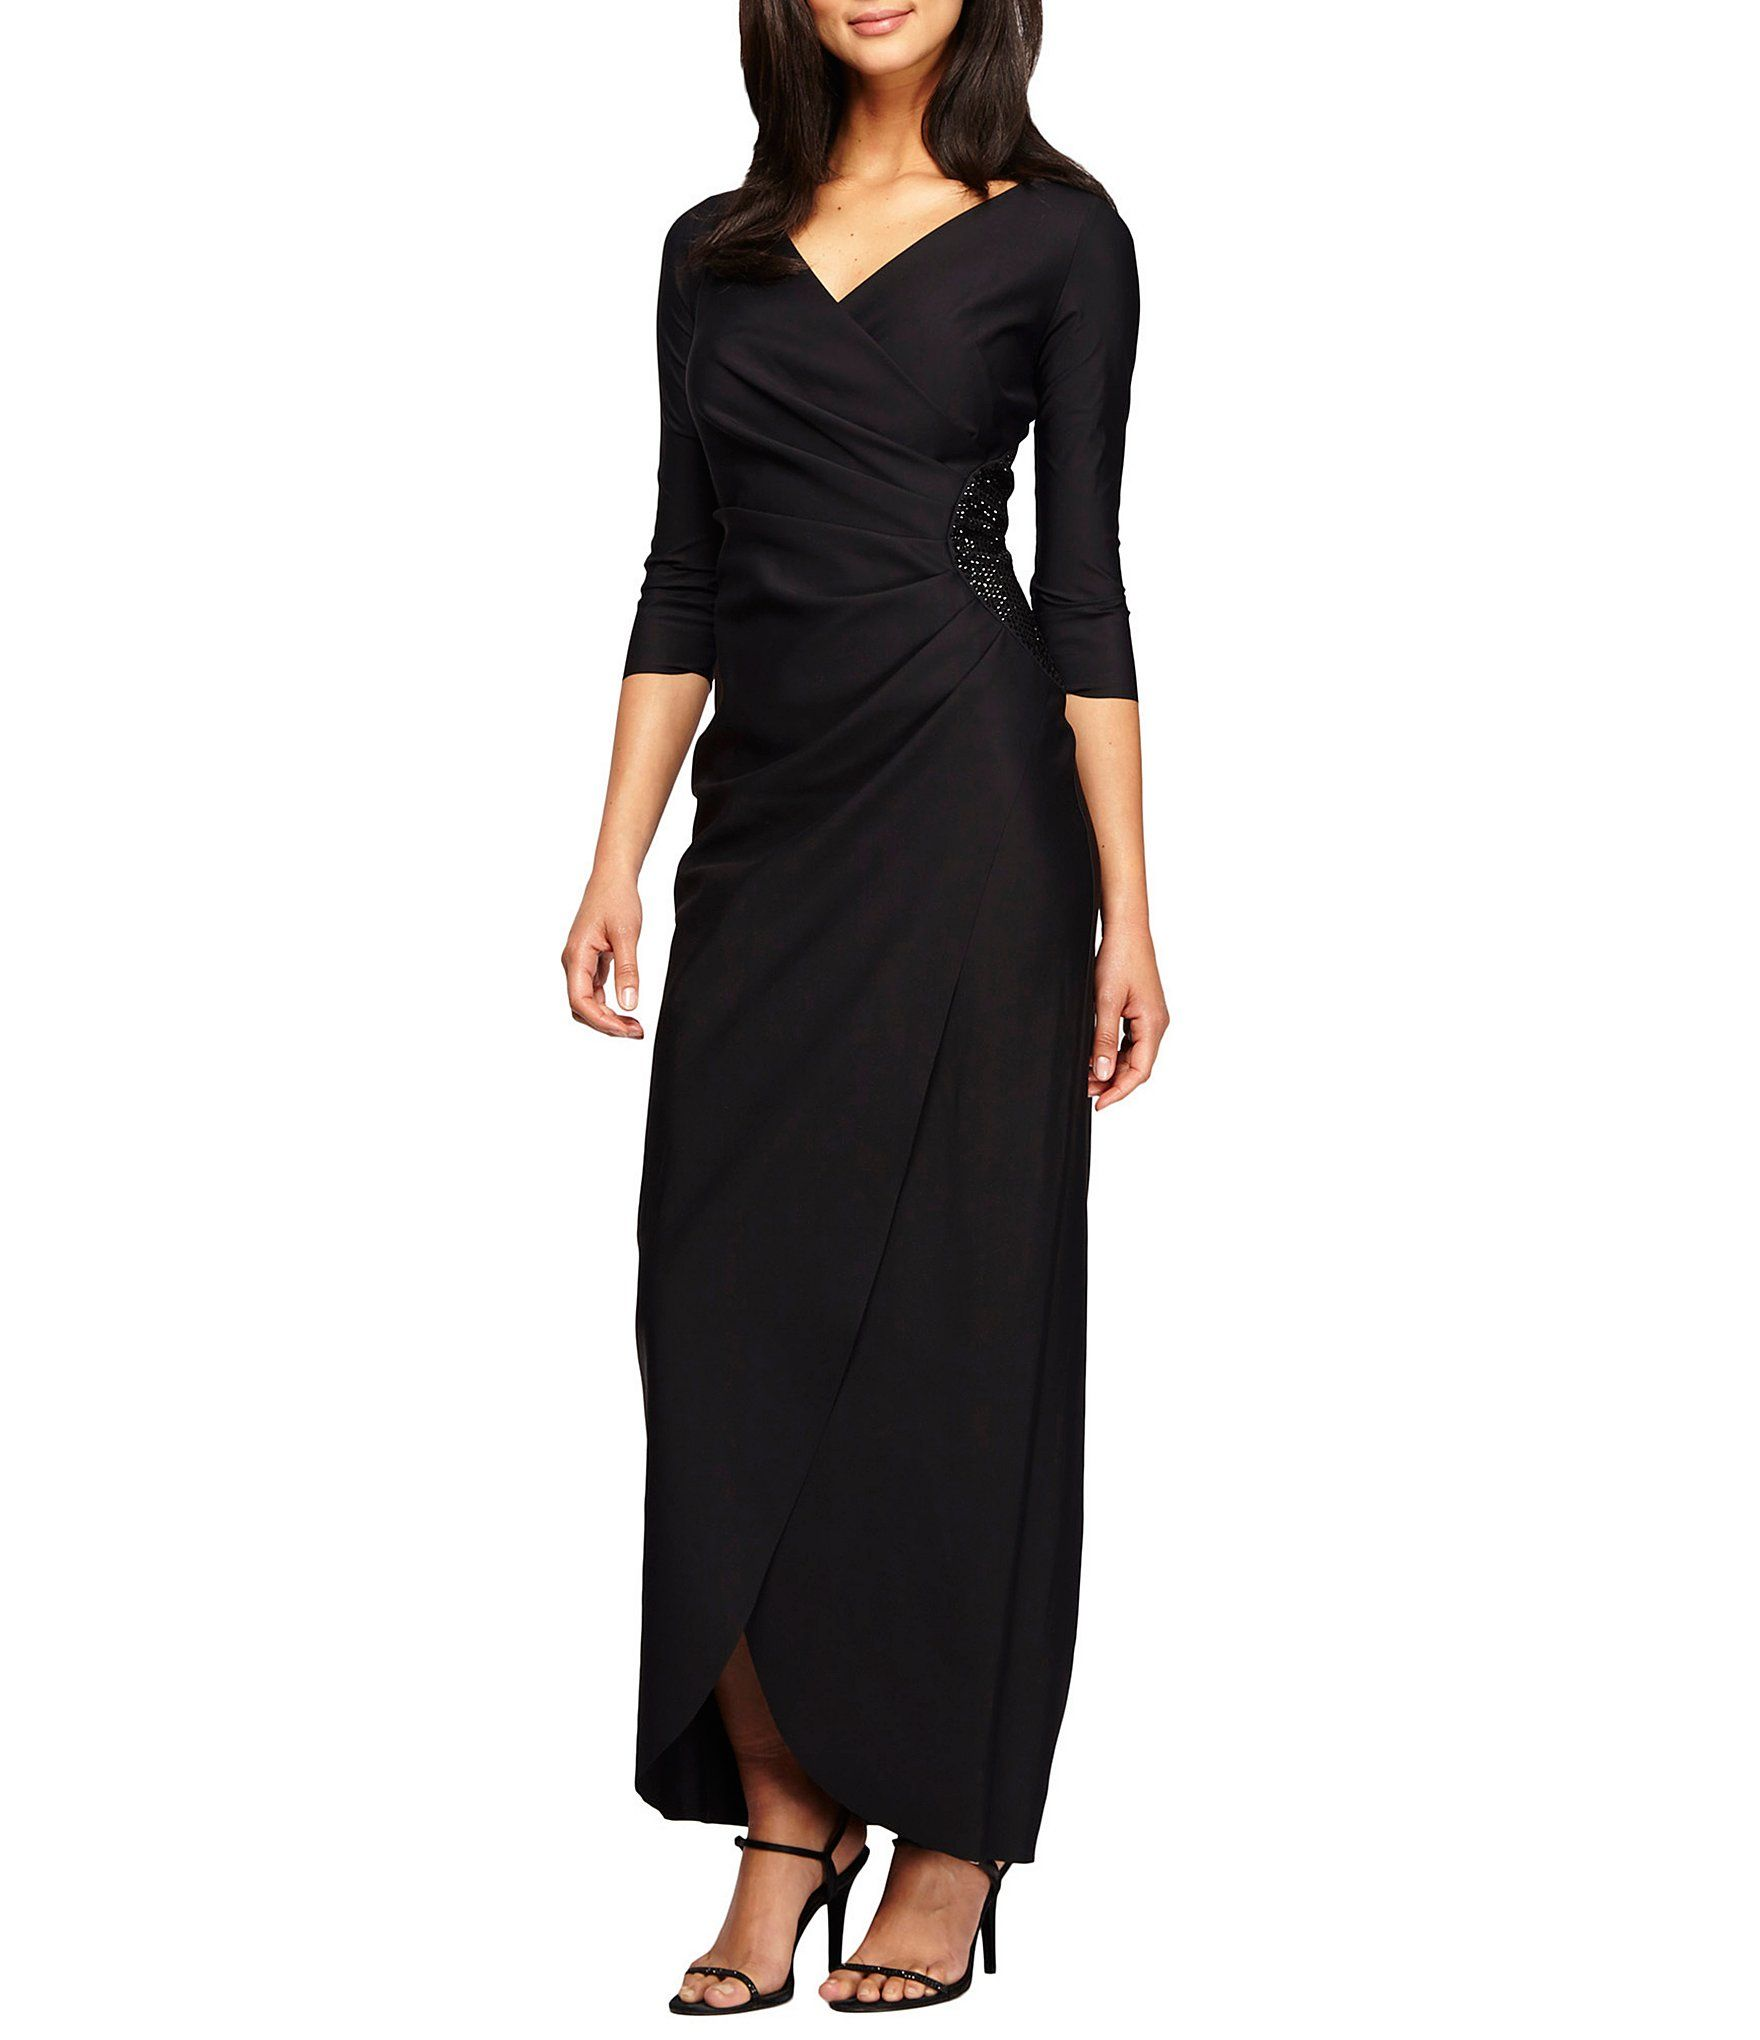 71063b1ea41 Alex Evenings Surplice VNeck Bead Trim Ruched Dress  Dillards ...